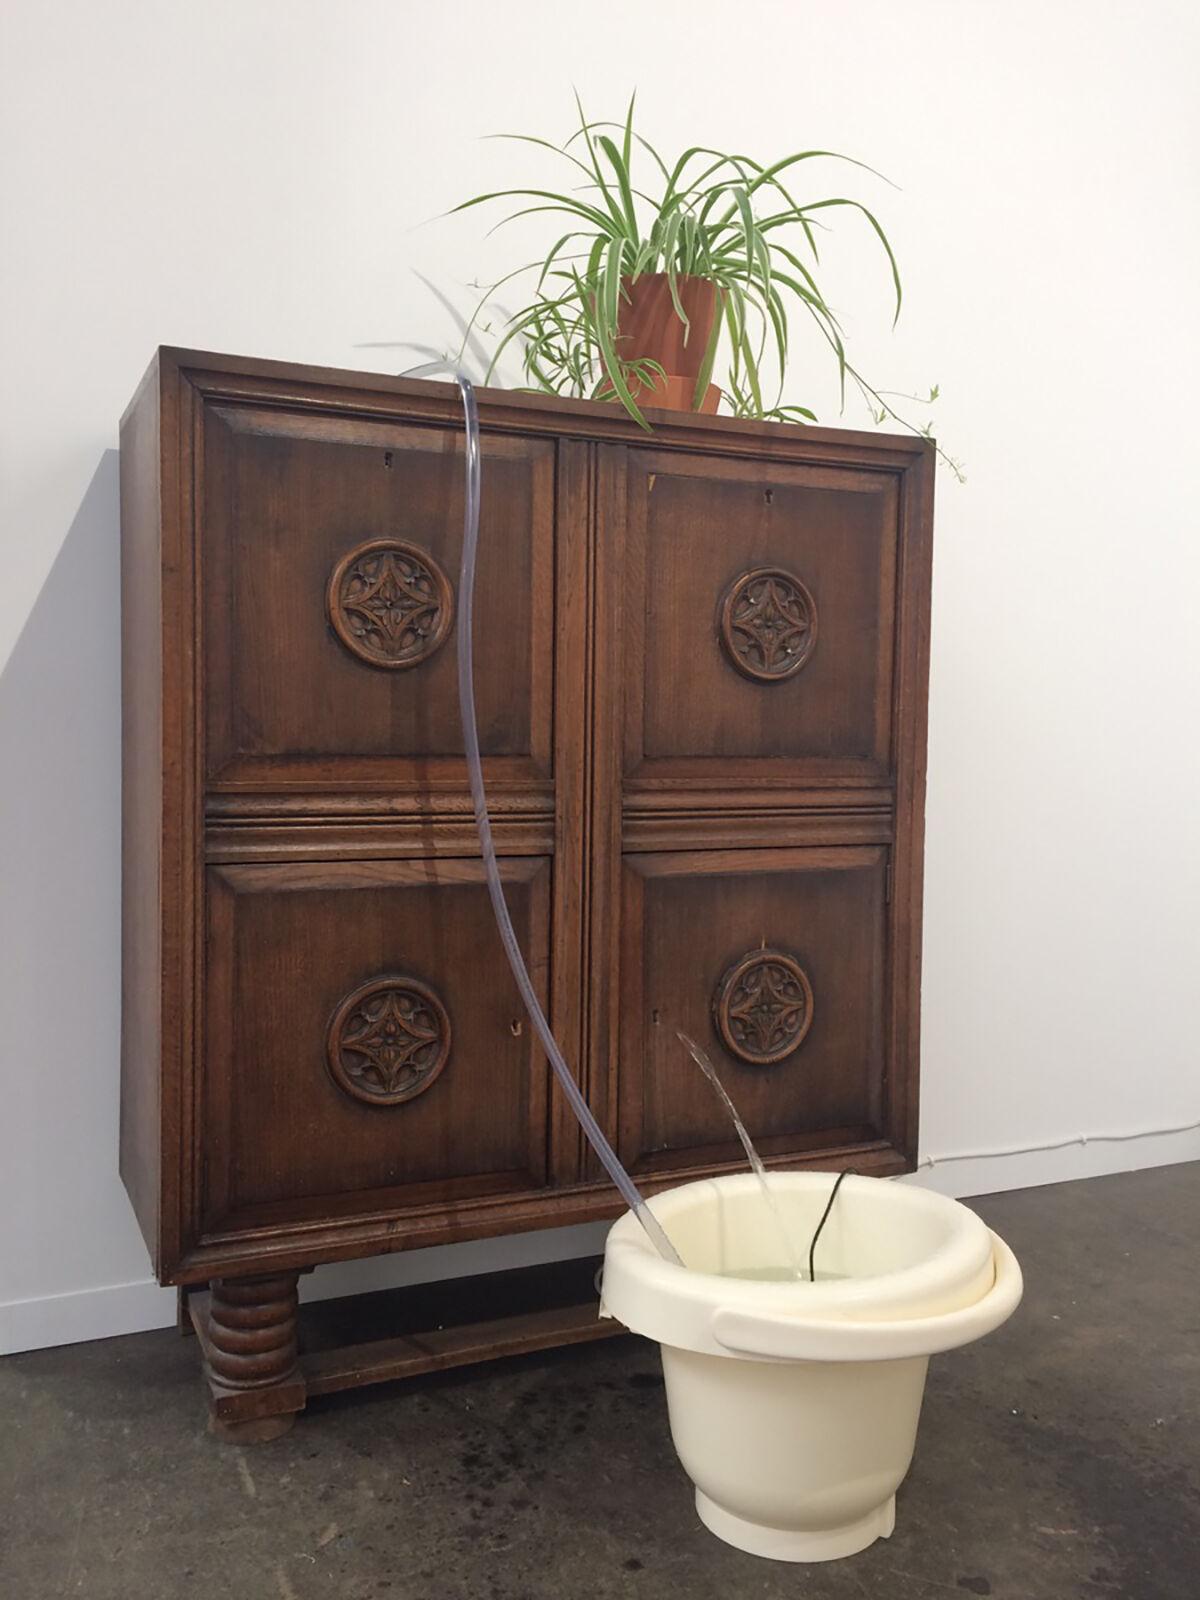 Leander Schönweger, The Inner Human III, 2017. Courtesy of Galerie Nathalie Halgand.